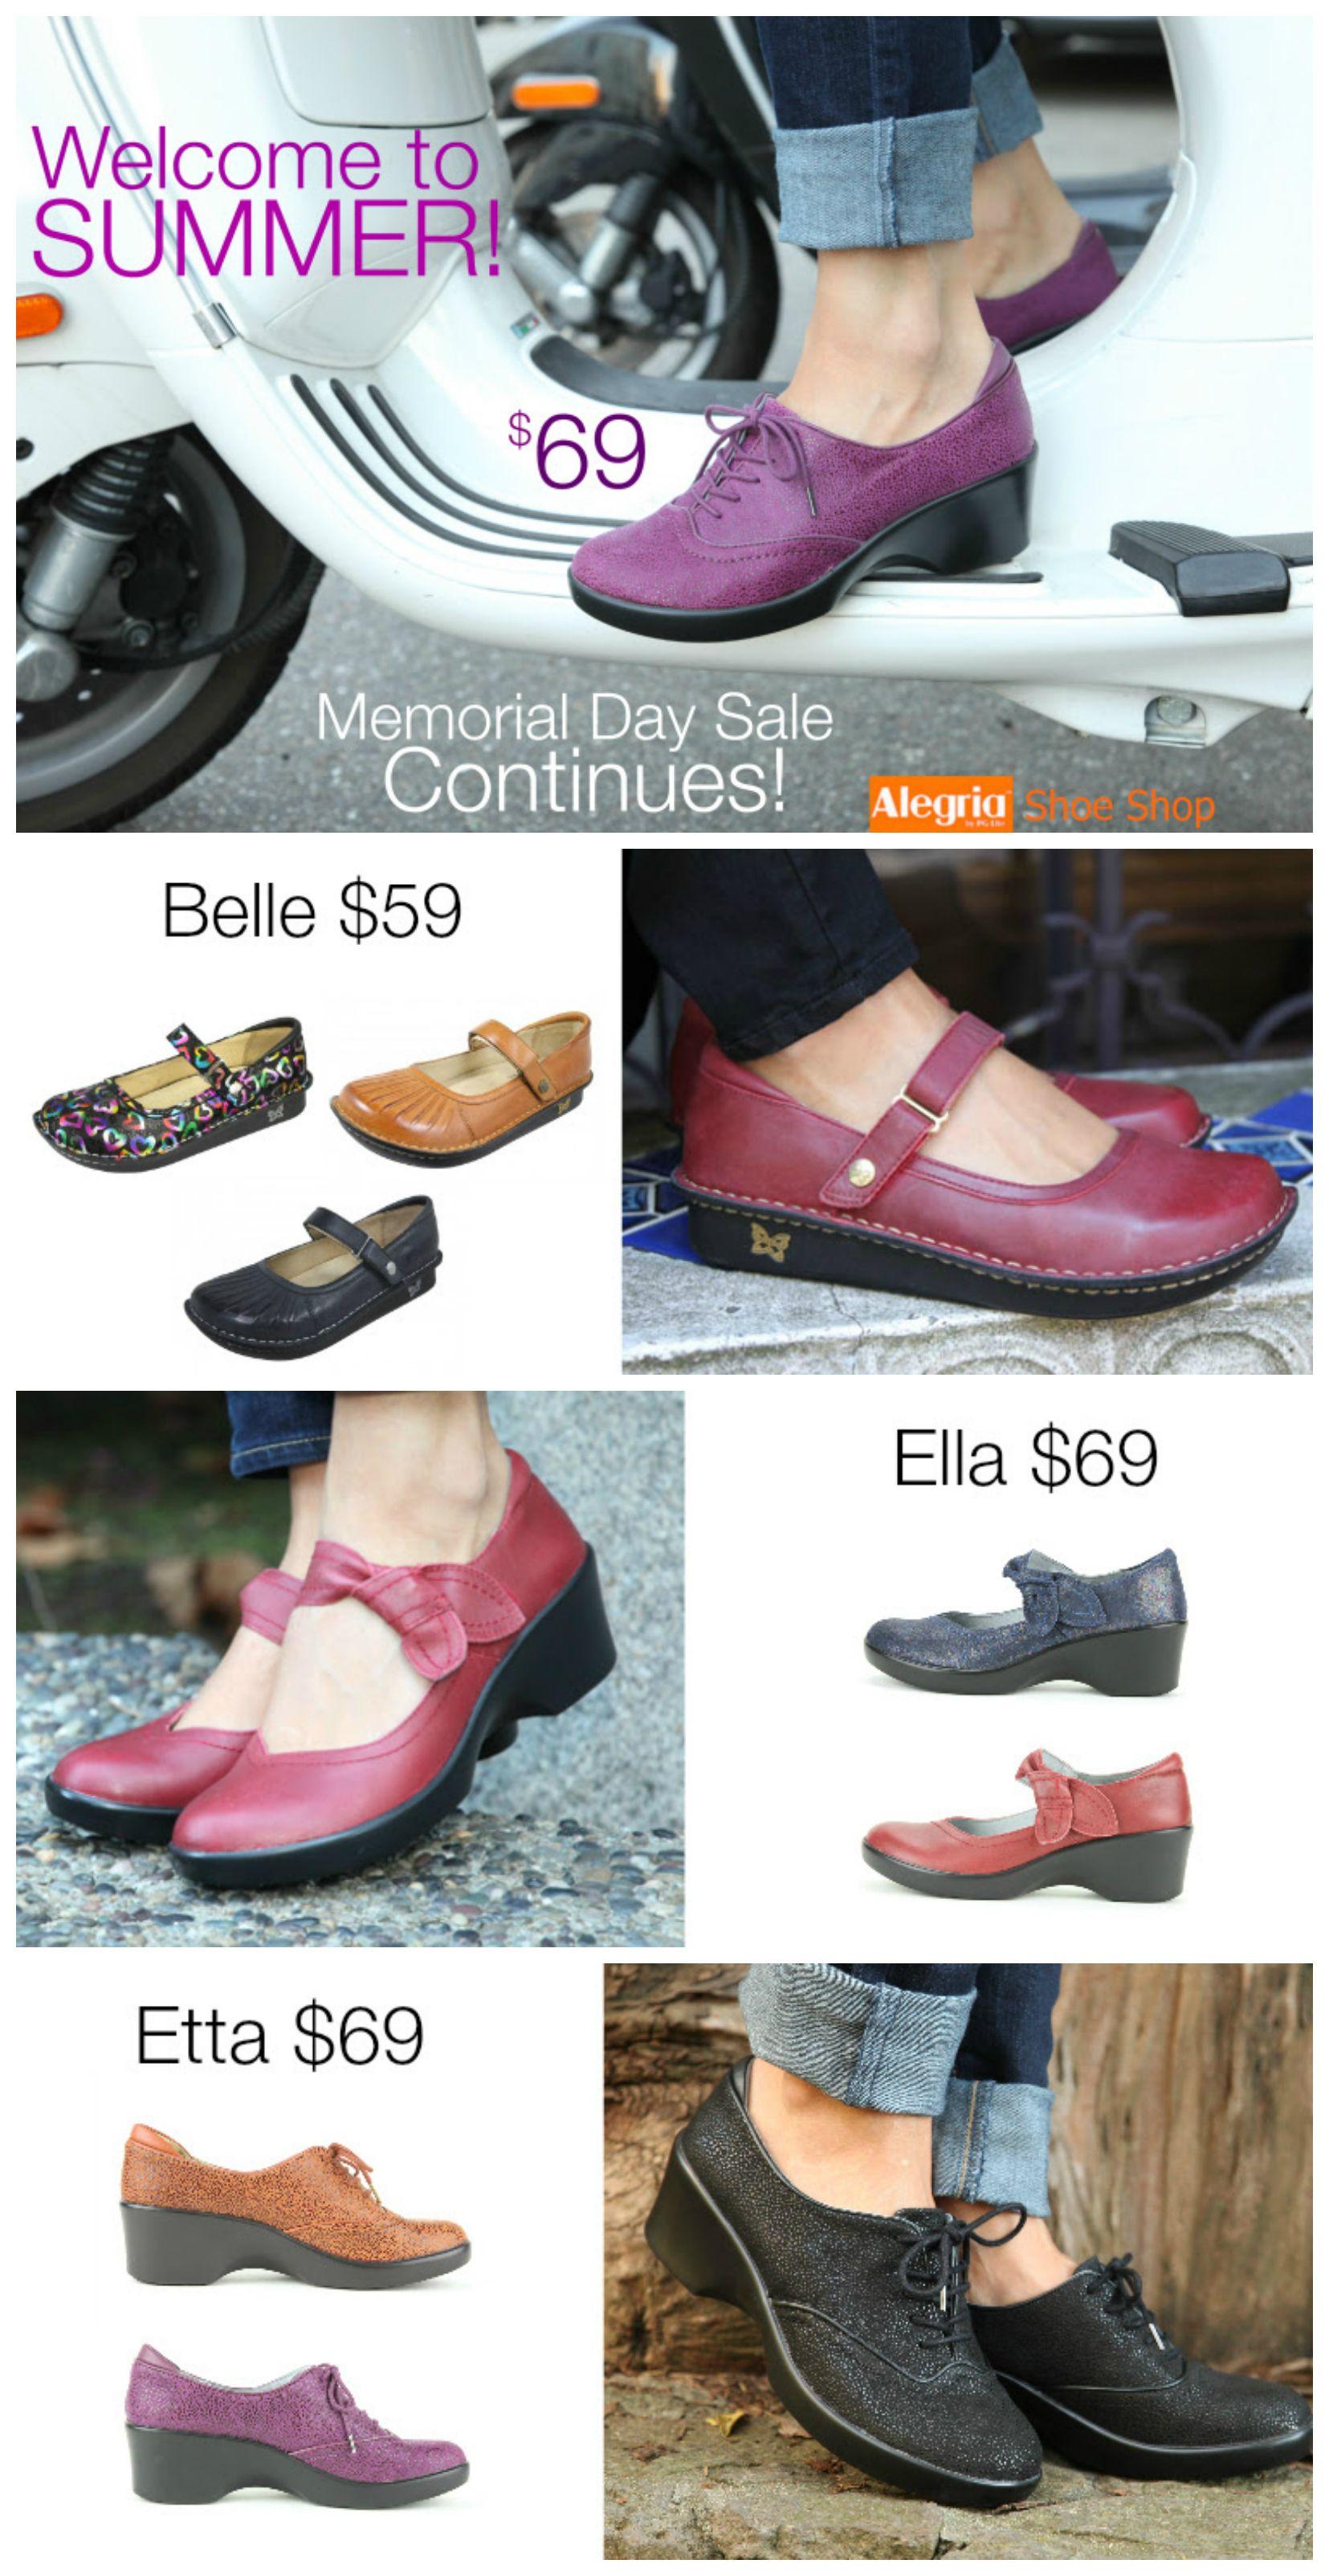 The Alegria Shoes Memorial Day